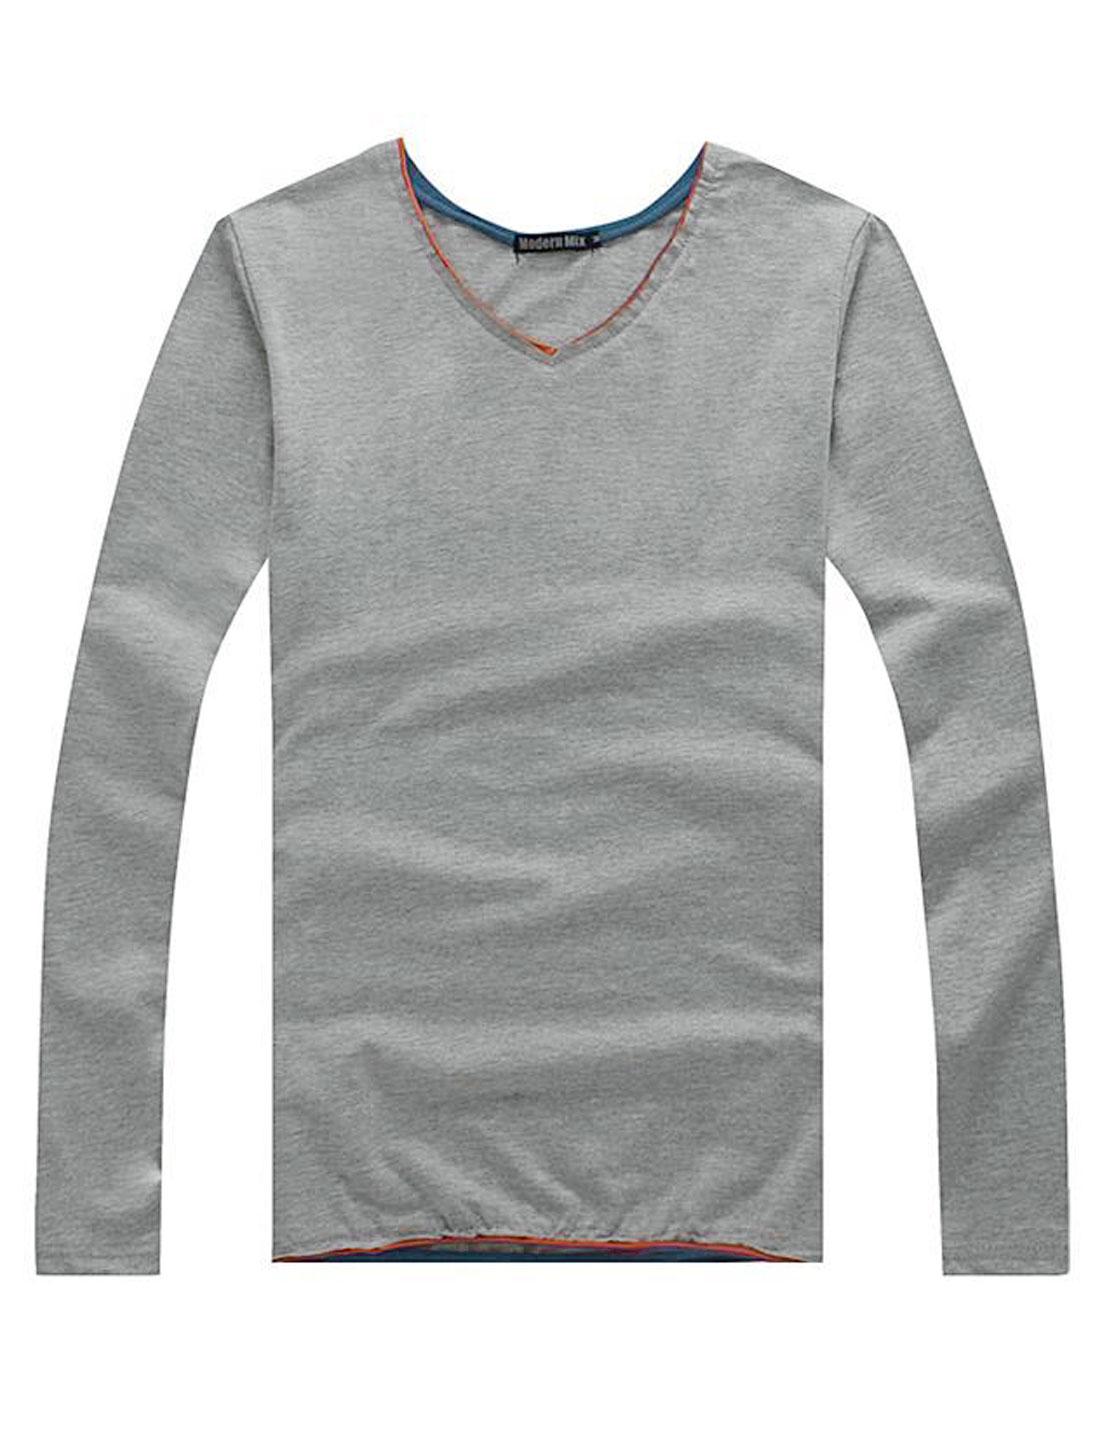 Men Pullover V Neck Slim Fit Leisure Shirt Light Gray M